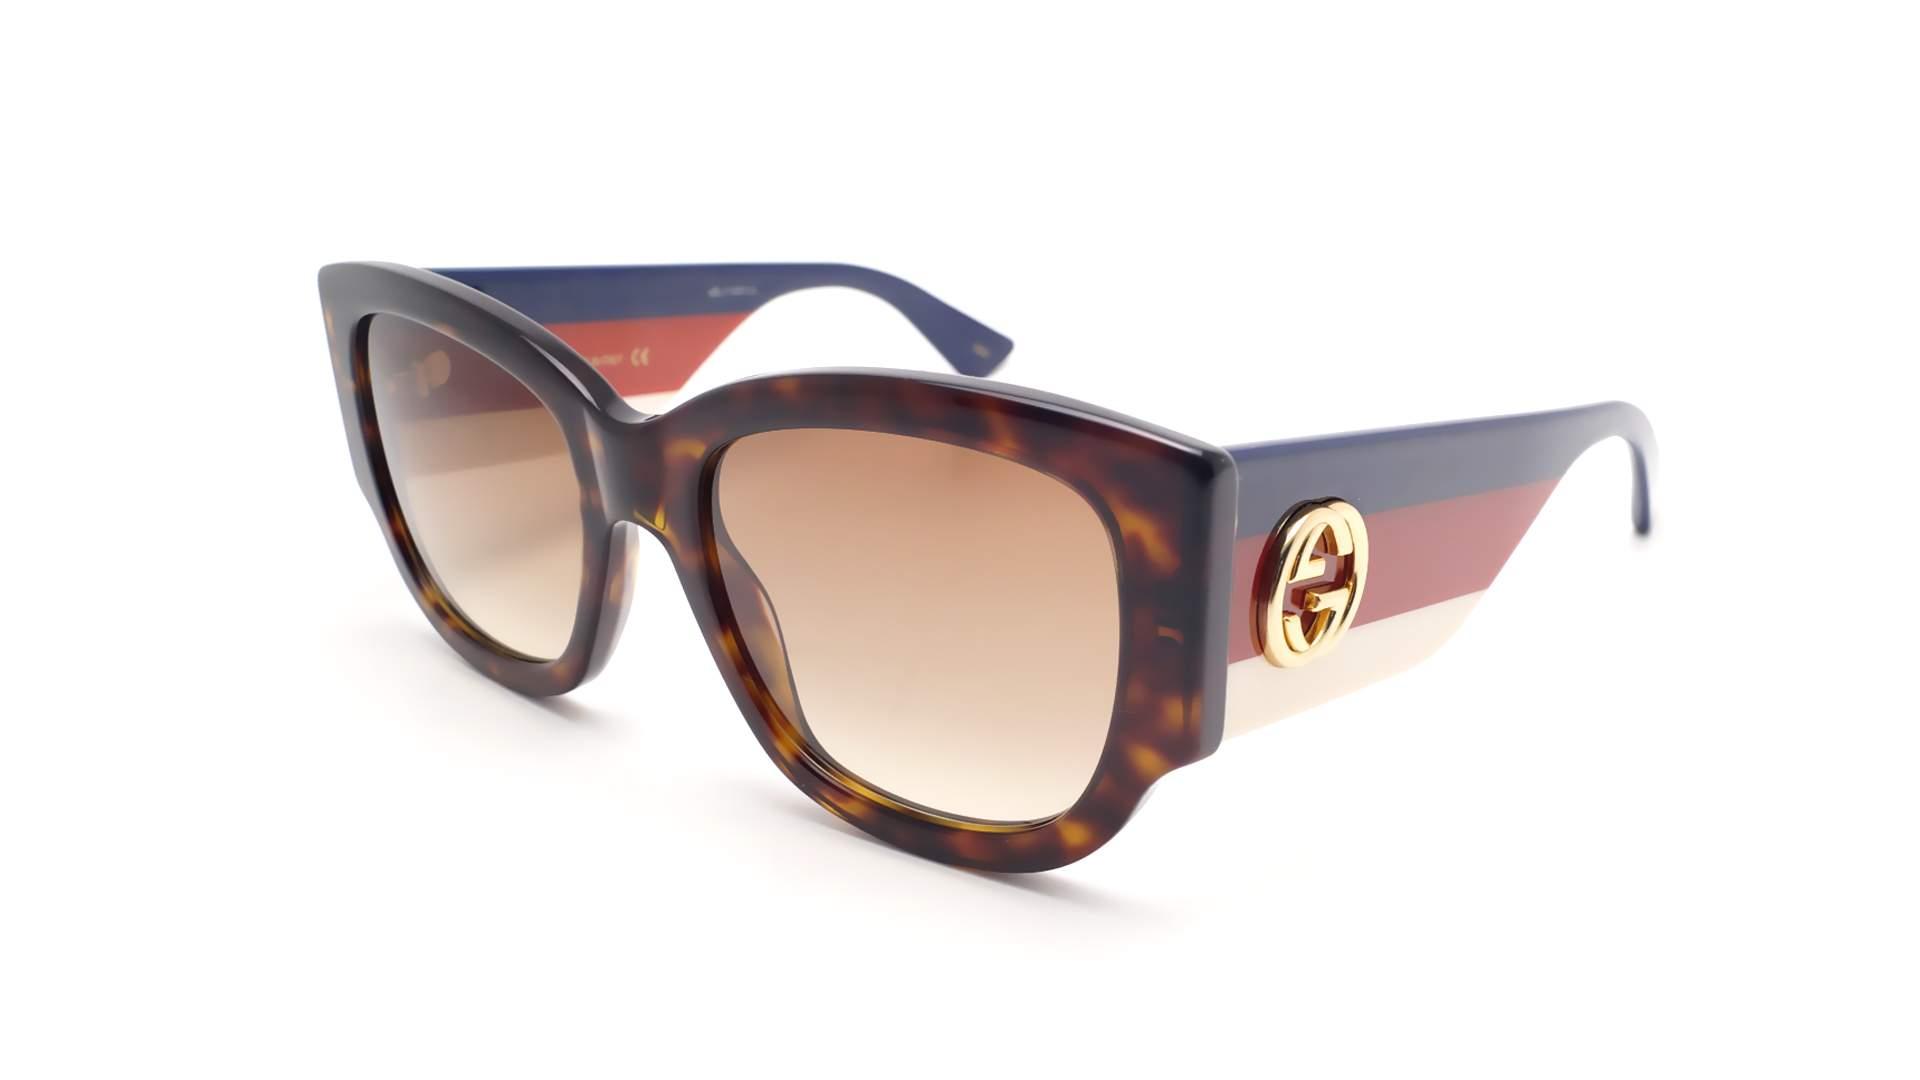 1addf18ce0 Sunglasses Gucci GG0276S 002 53-20 Tortoise Medium